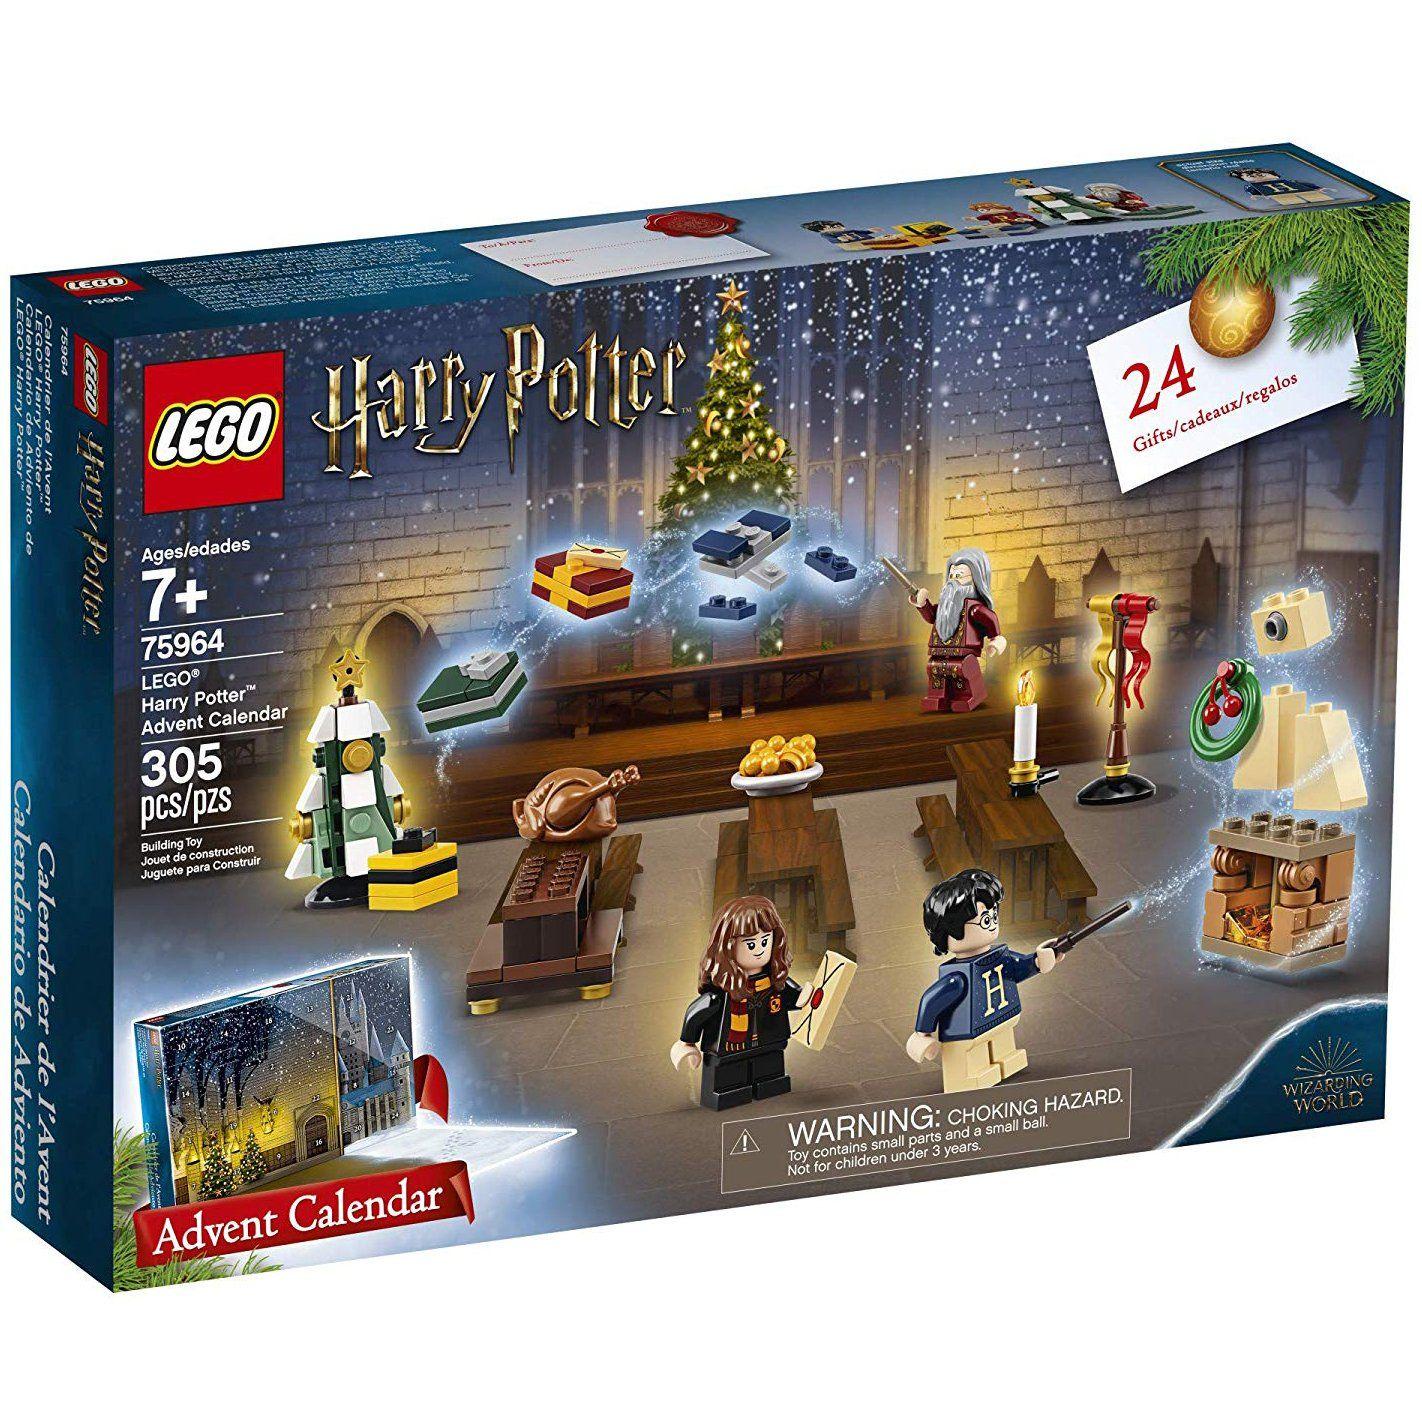 Lego 75964 Harry Potter Advent Calendar Harry Potter Advent Calendar Harry Potter Lego Sets Lego Harry Potter